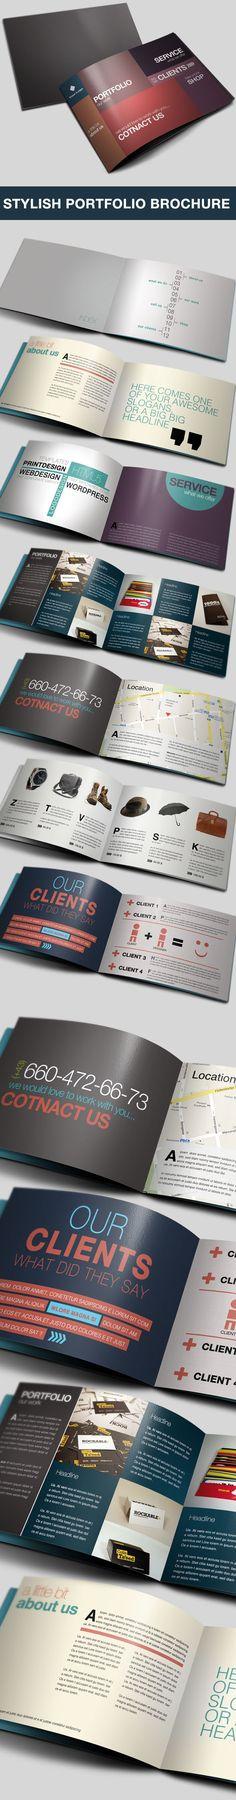 Portfolio Brochure by Danijel Mokic, via Behance